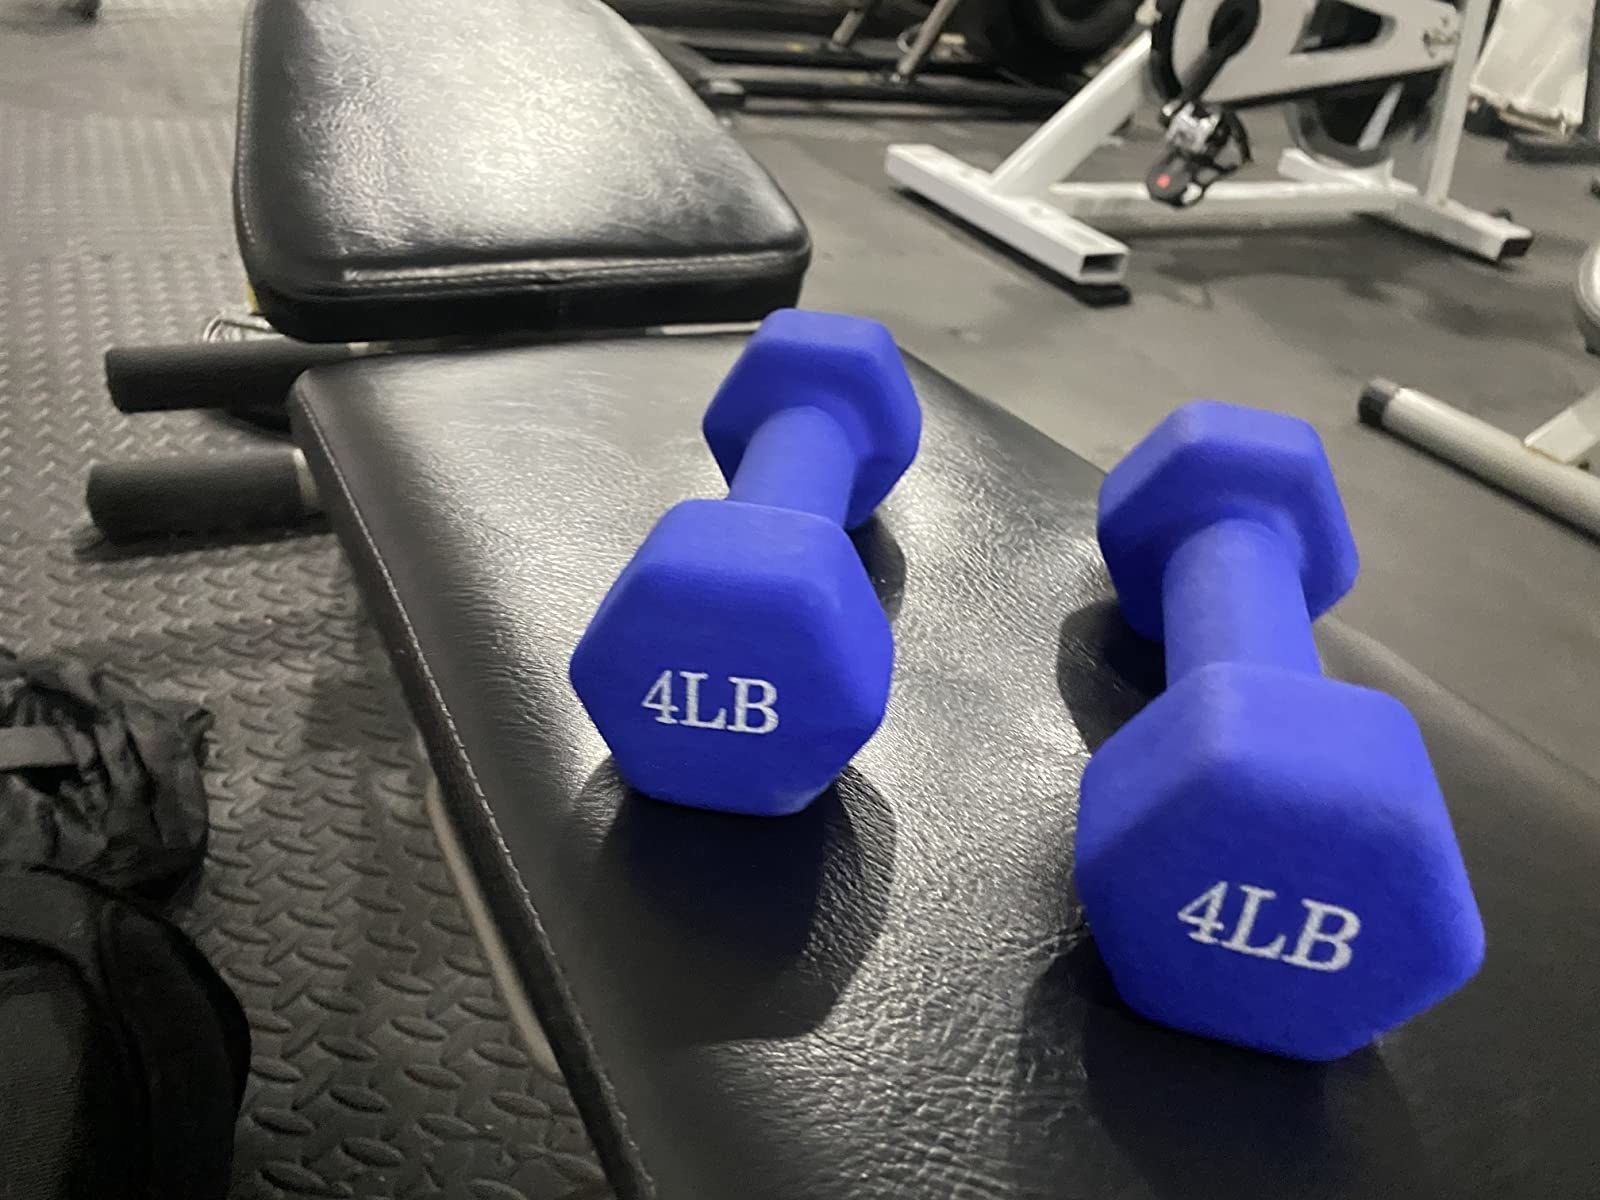 Four-pound weights in blue